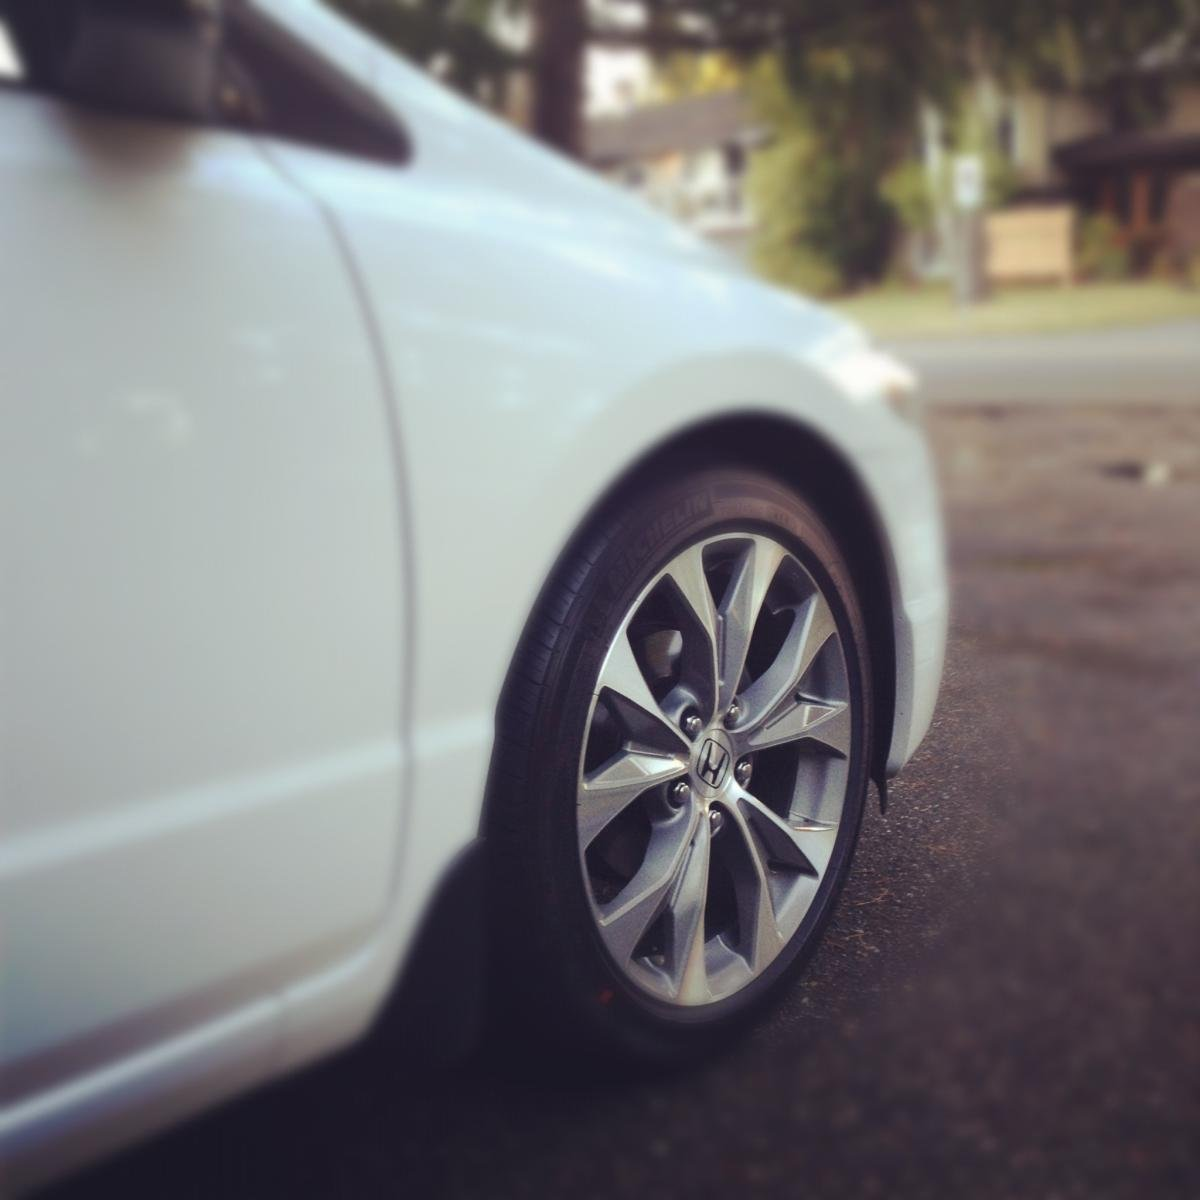 Honda/Acura Rims On An 8th Gen